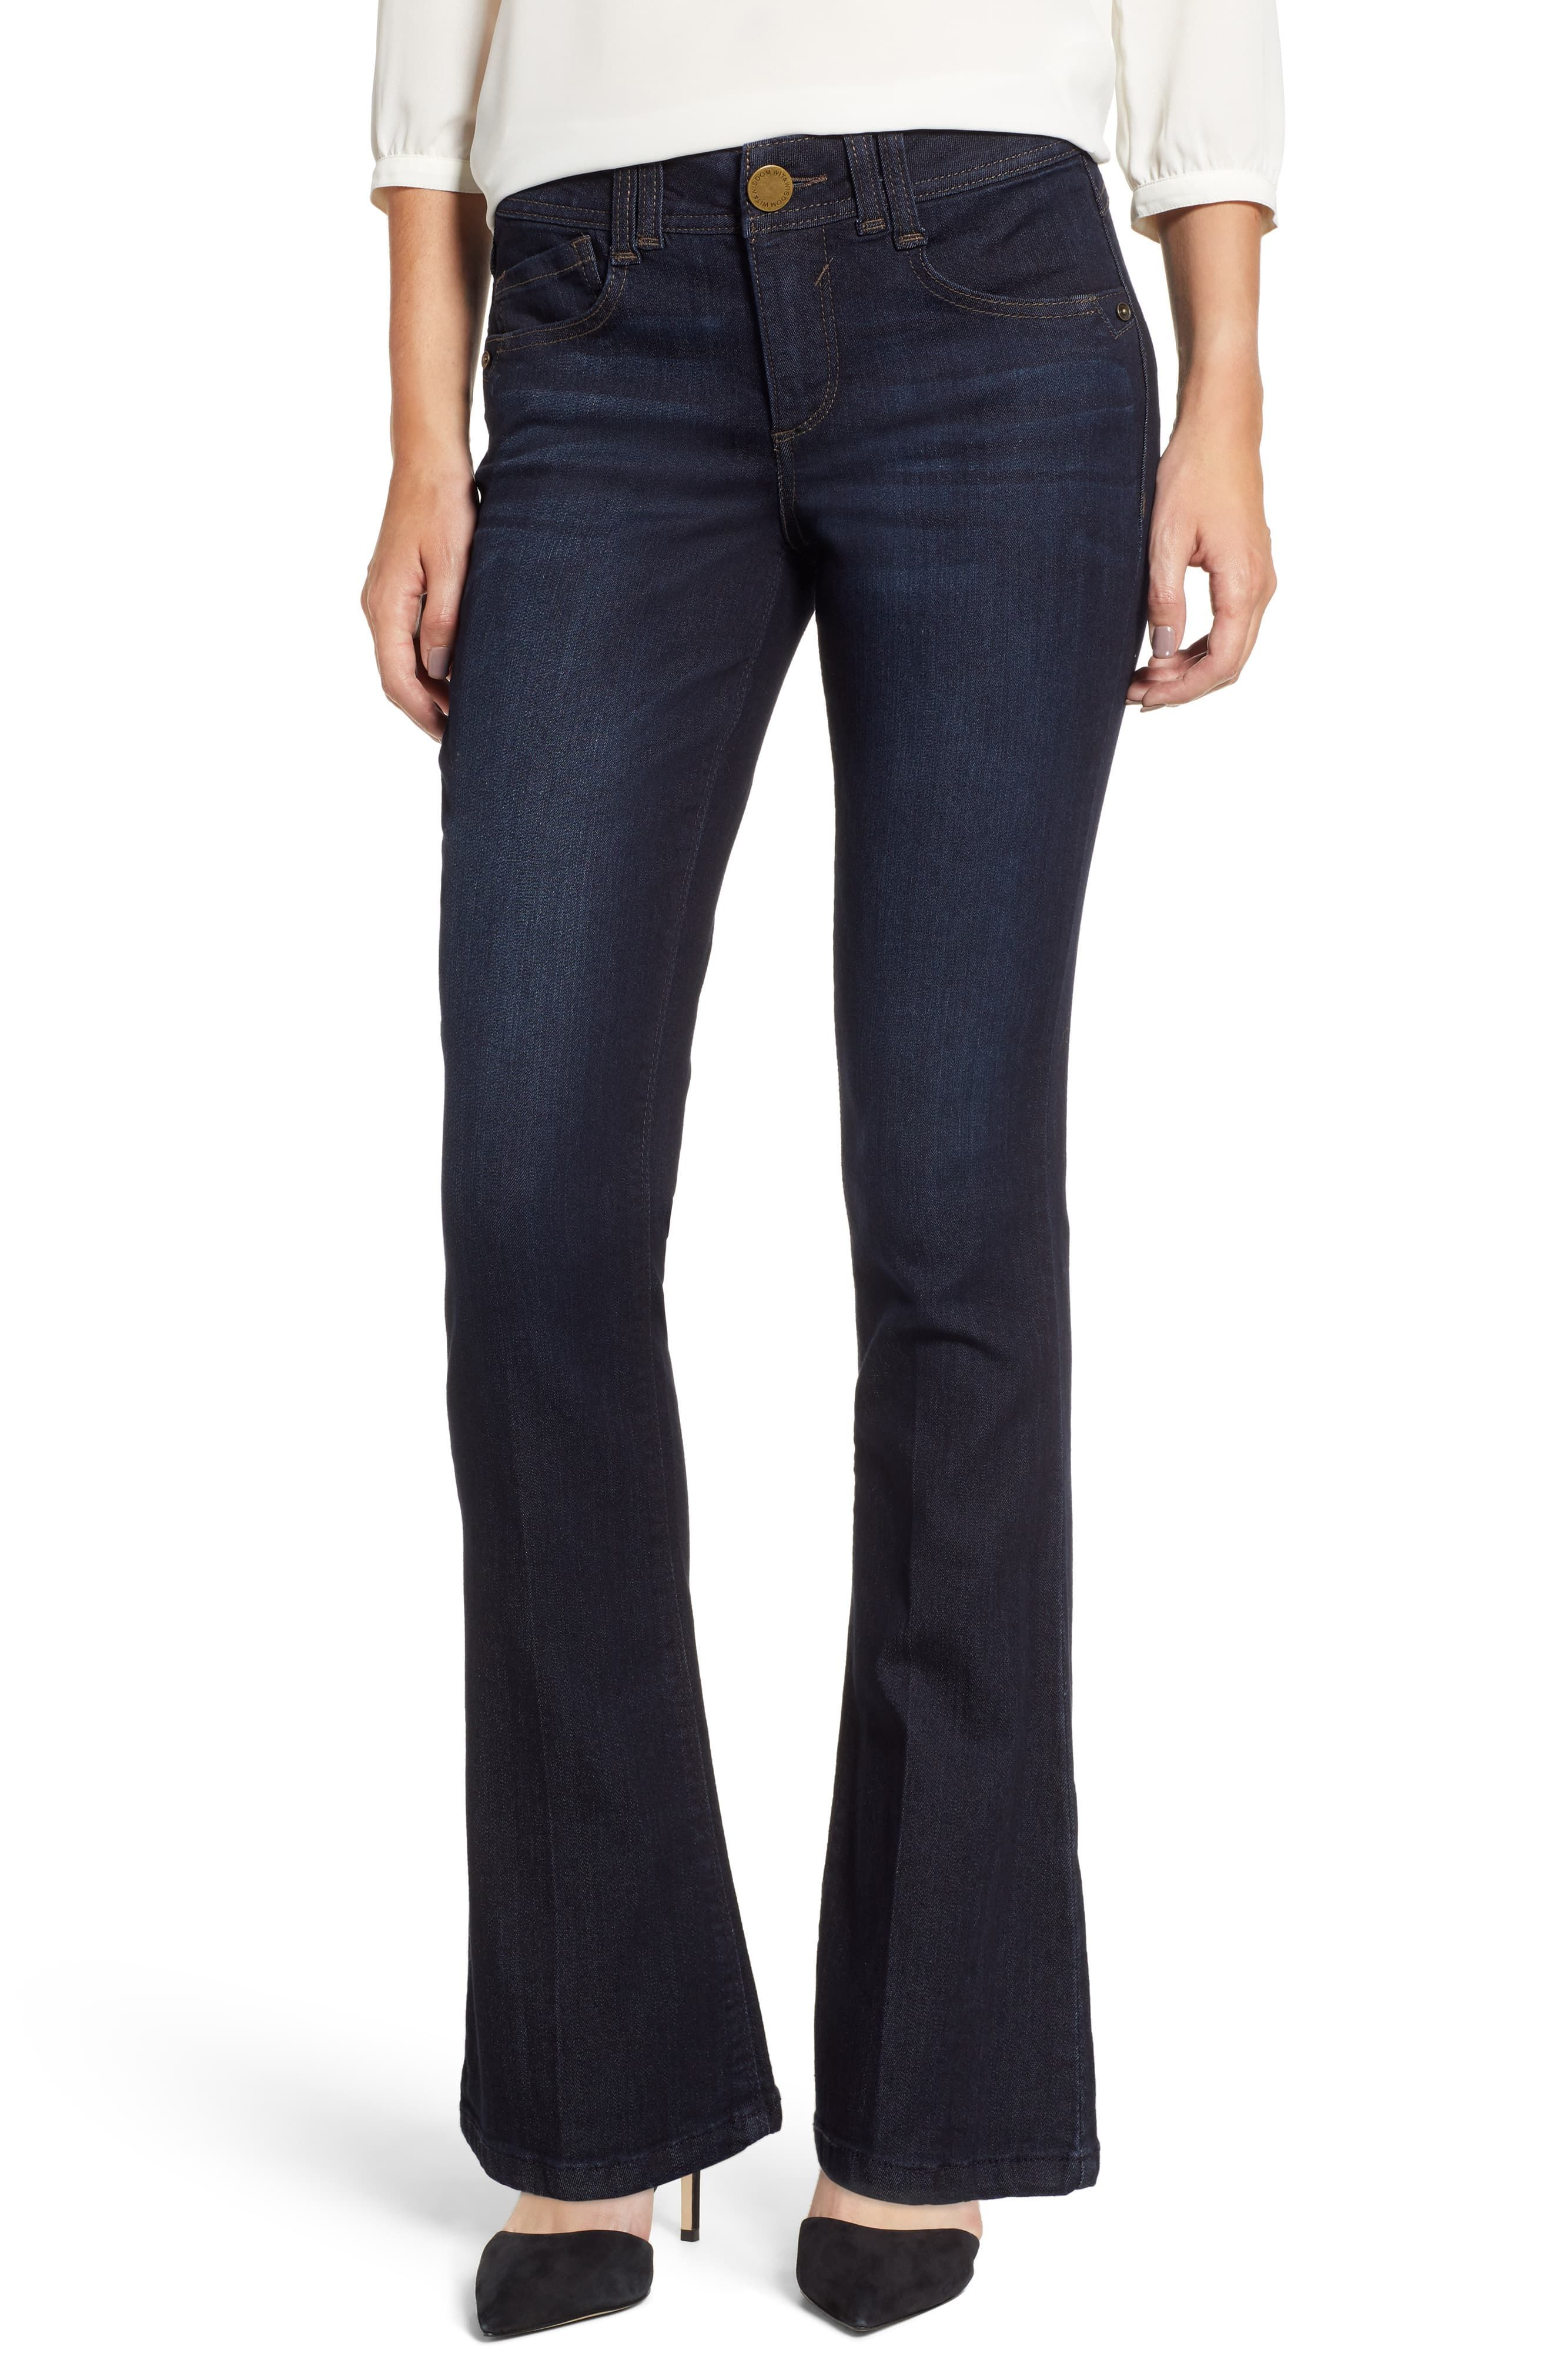 Petite Women S Wit Wisdom Ab Solution Itty Bitty Bootcut Jeans